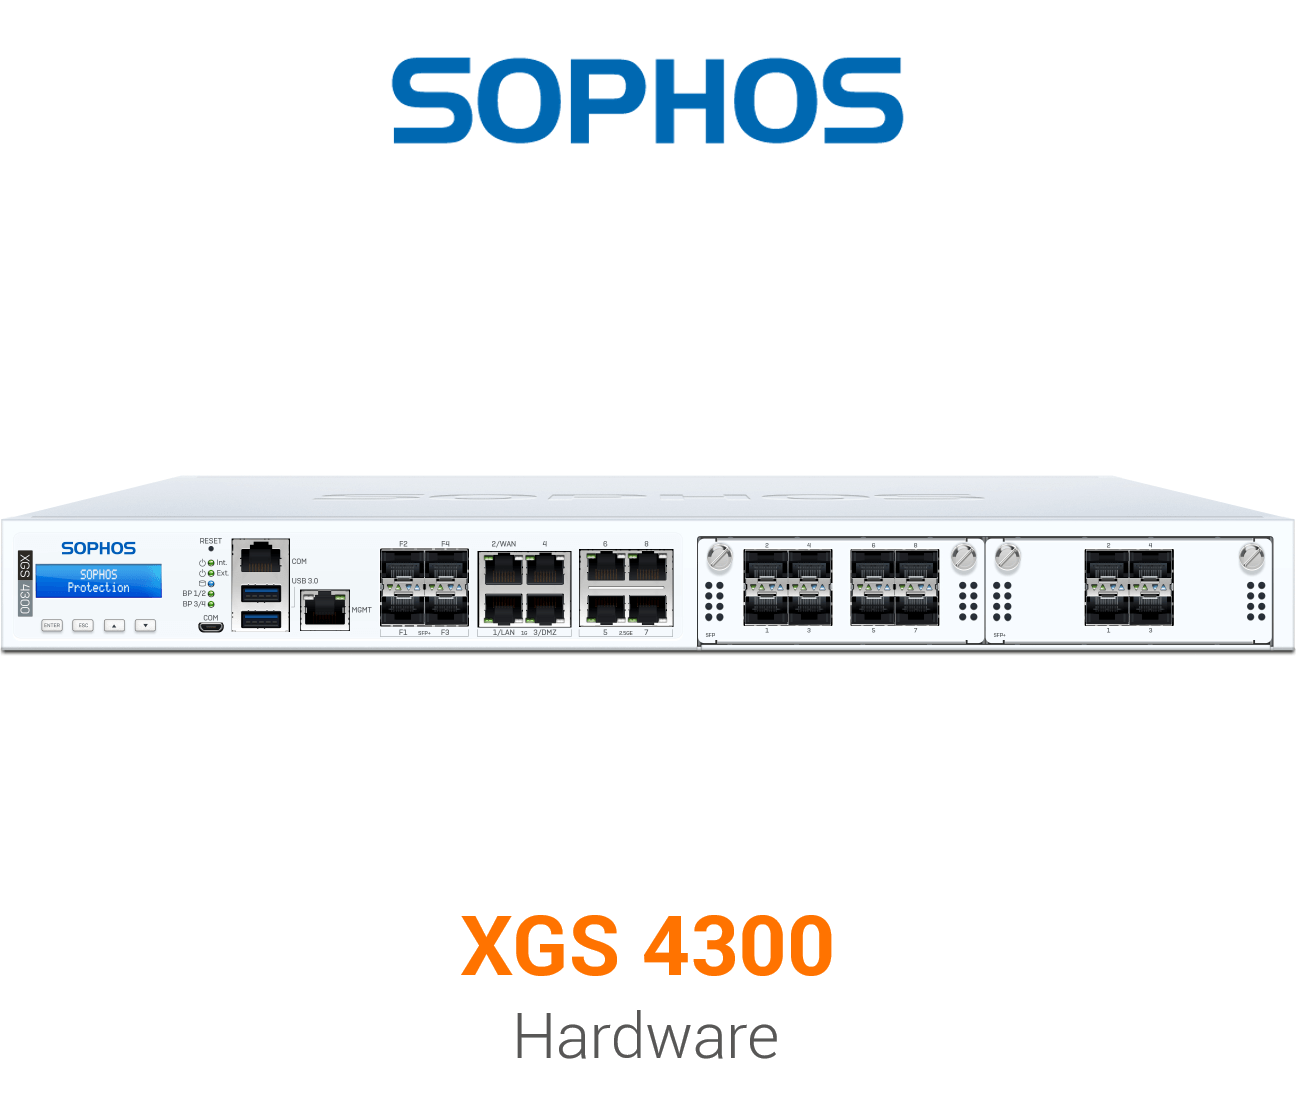 Sophos XGS 4300 Security Appliance